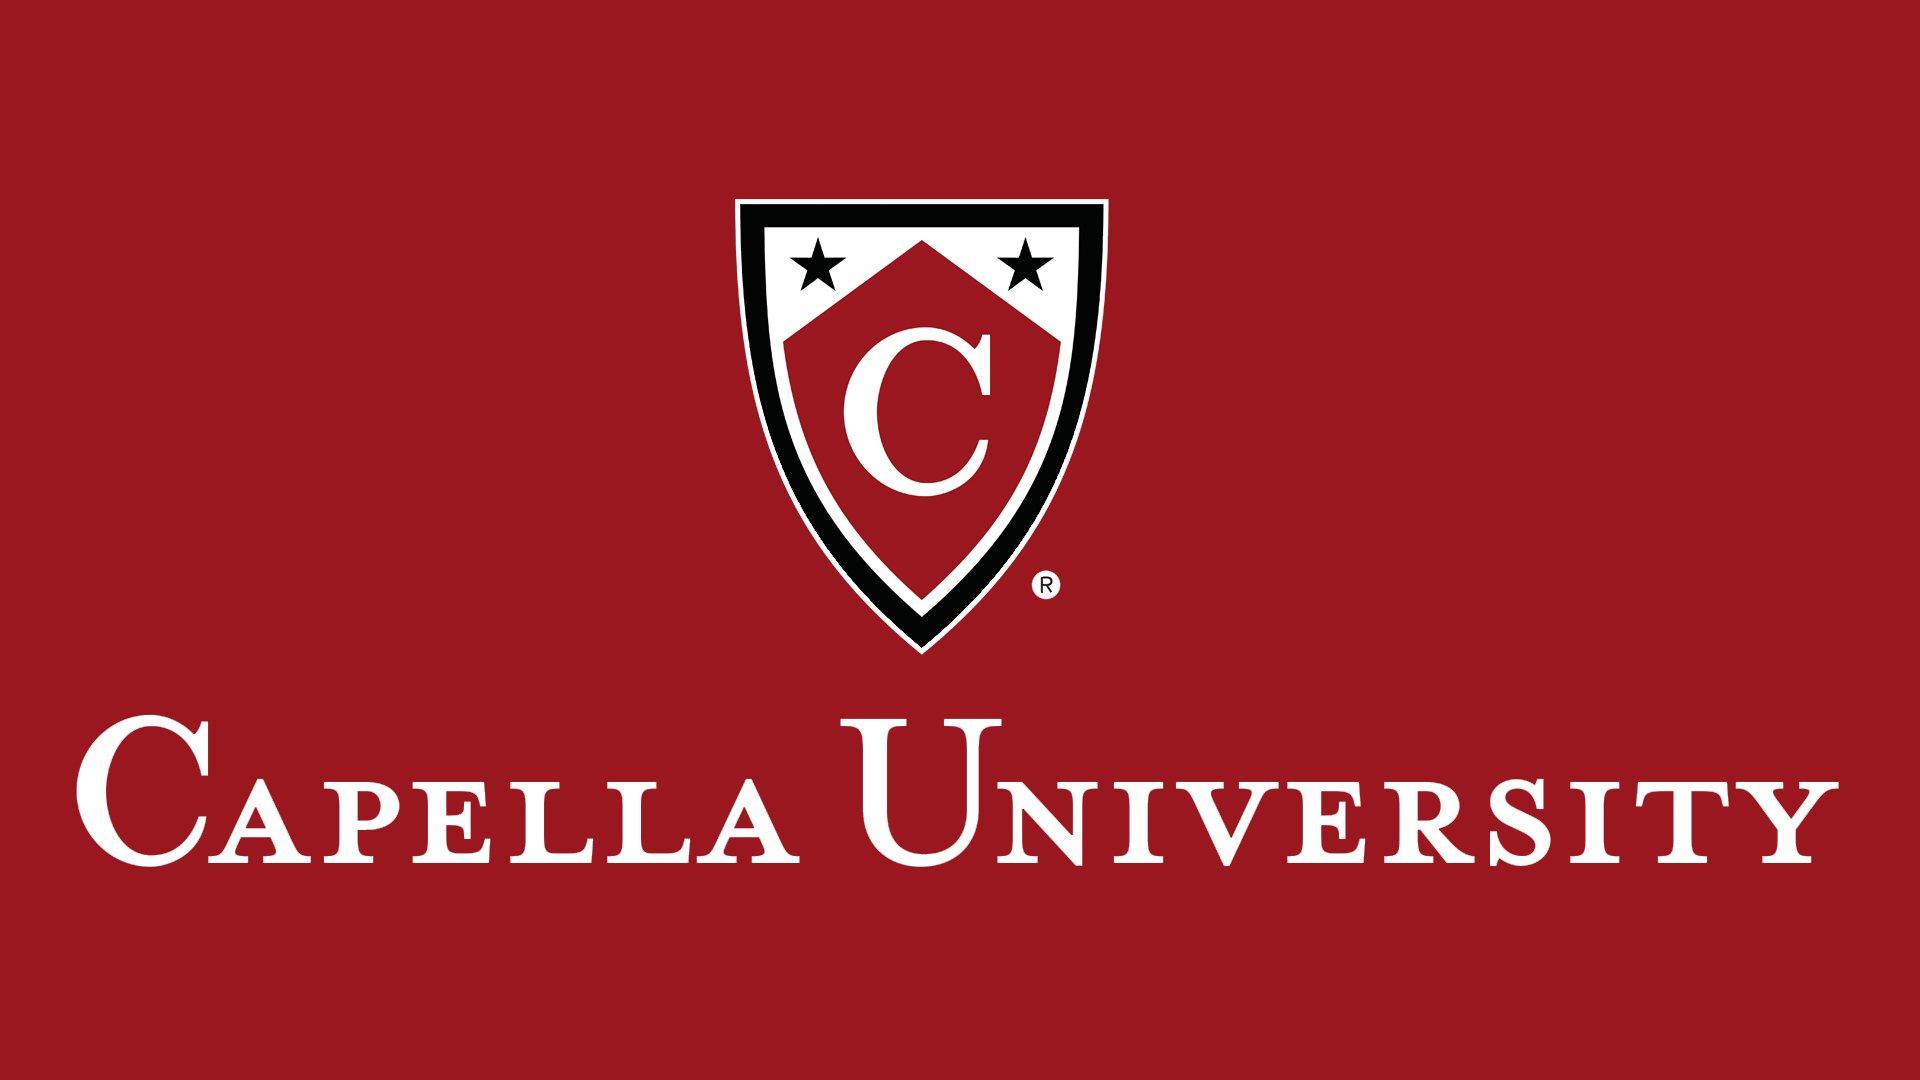 Capella University Logo, Capella University Symbol ...